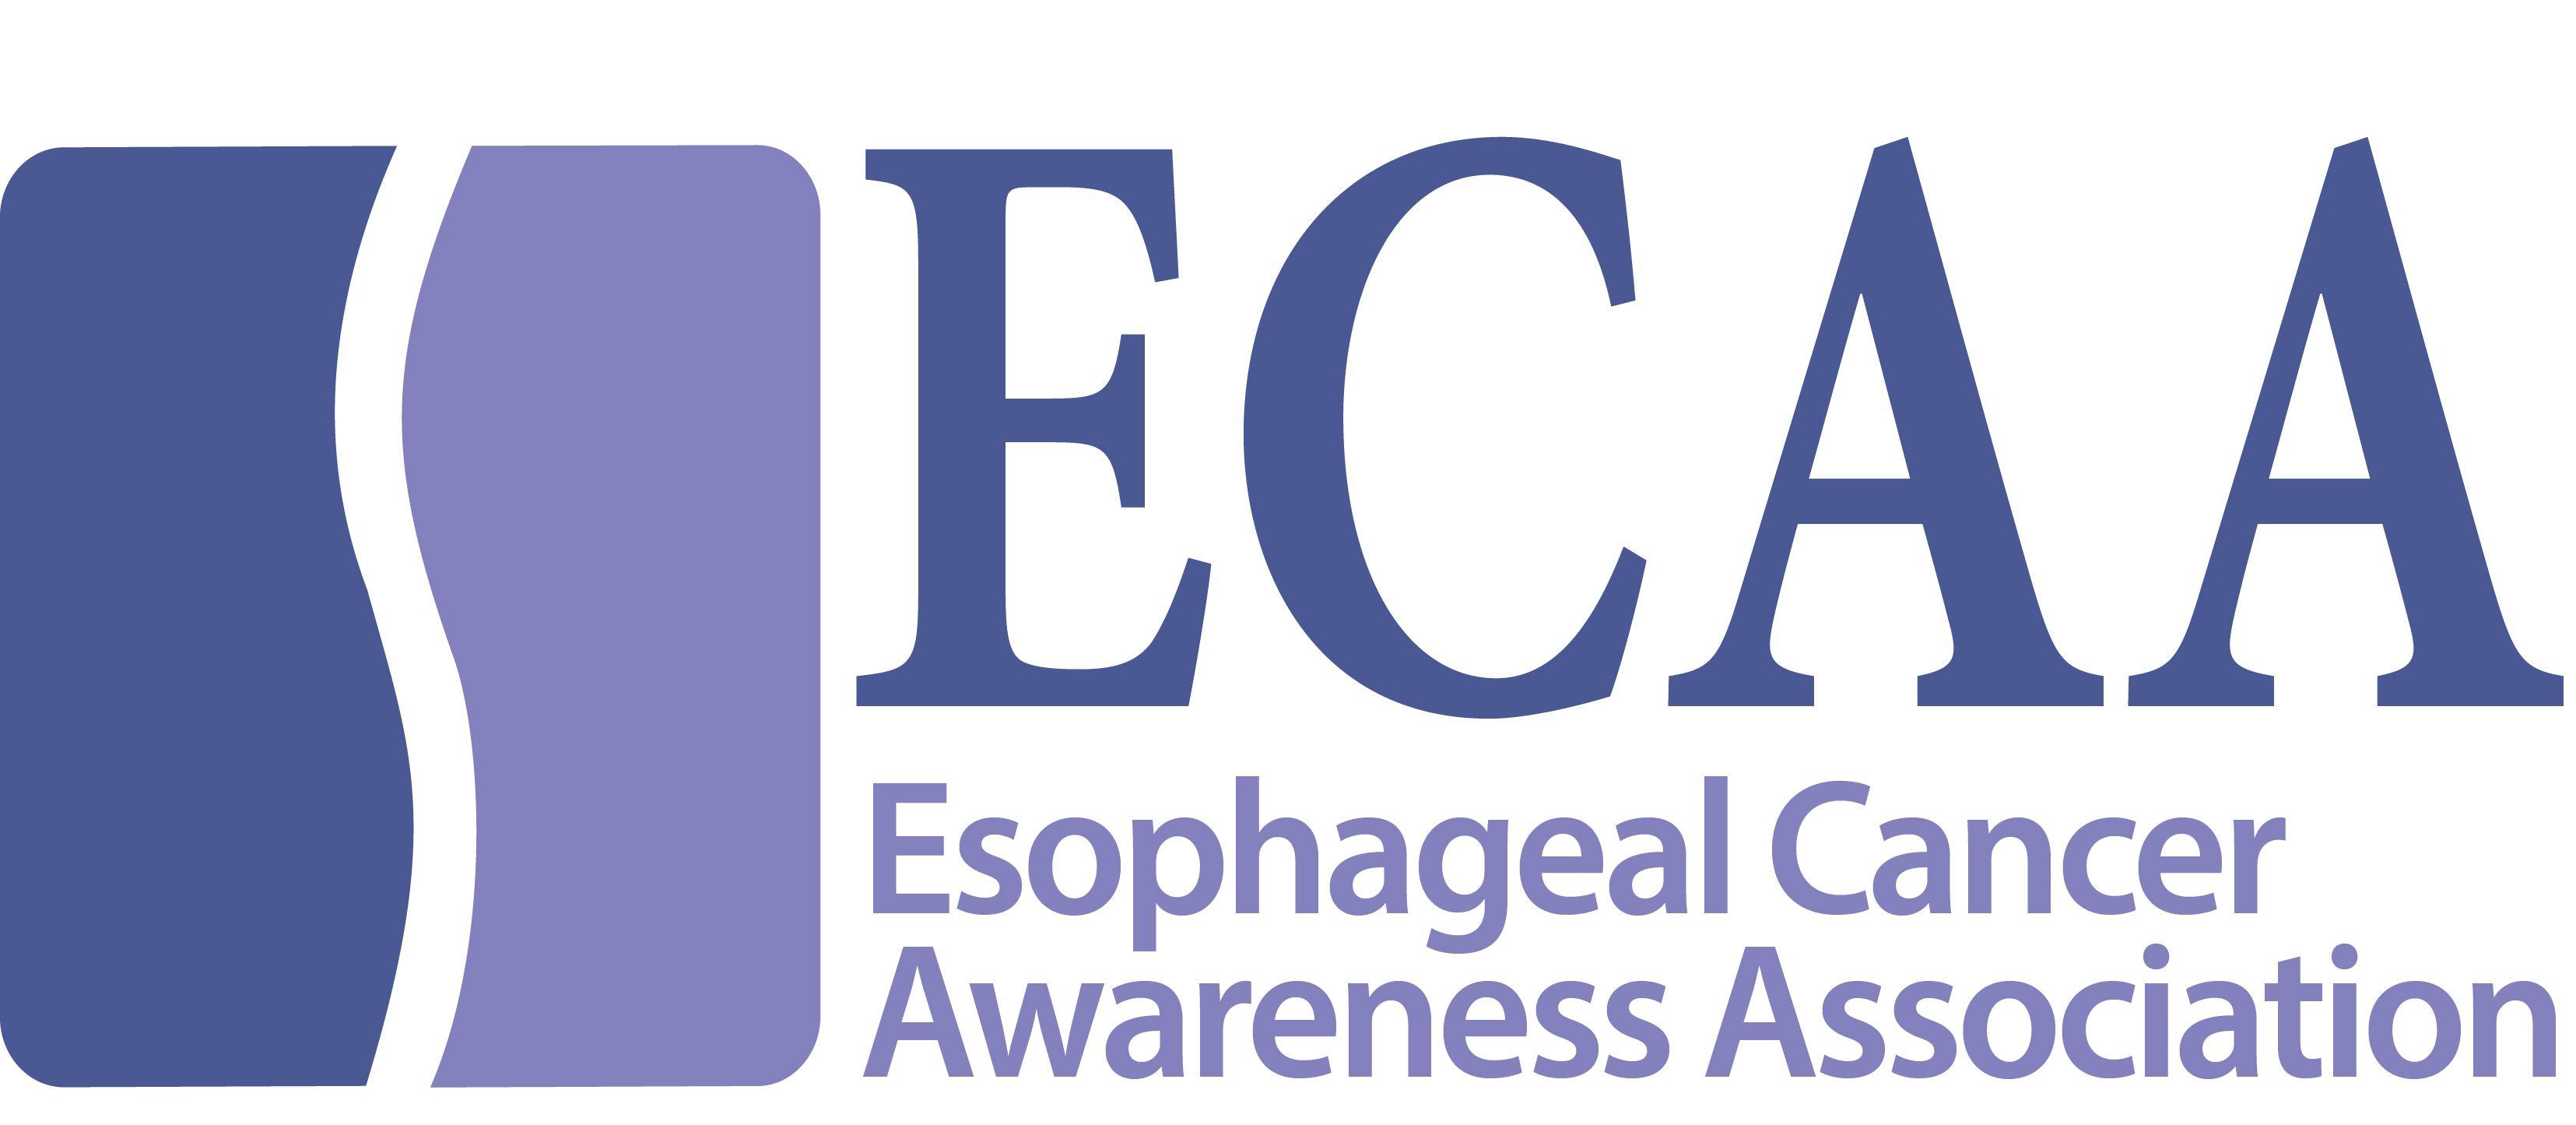 Advocacy Groups | <b>Esophageal Cancer Awareness Association</b>